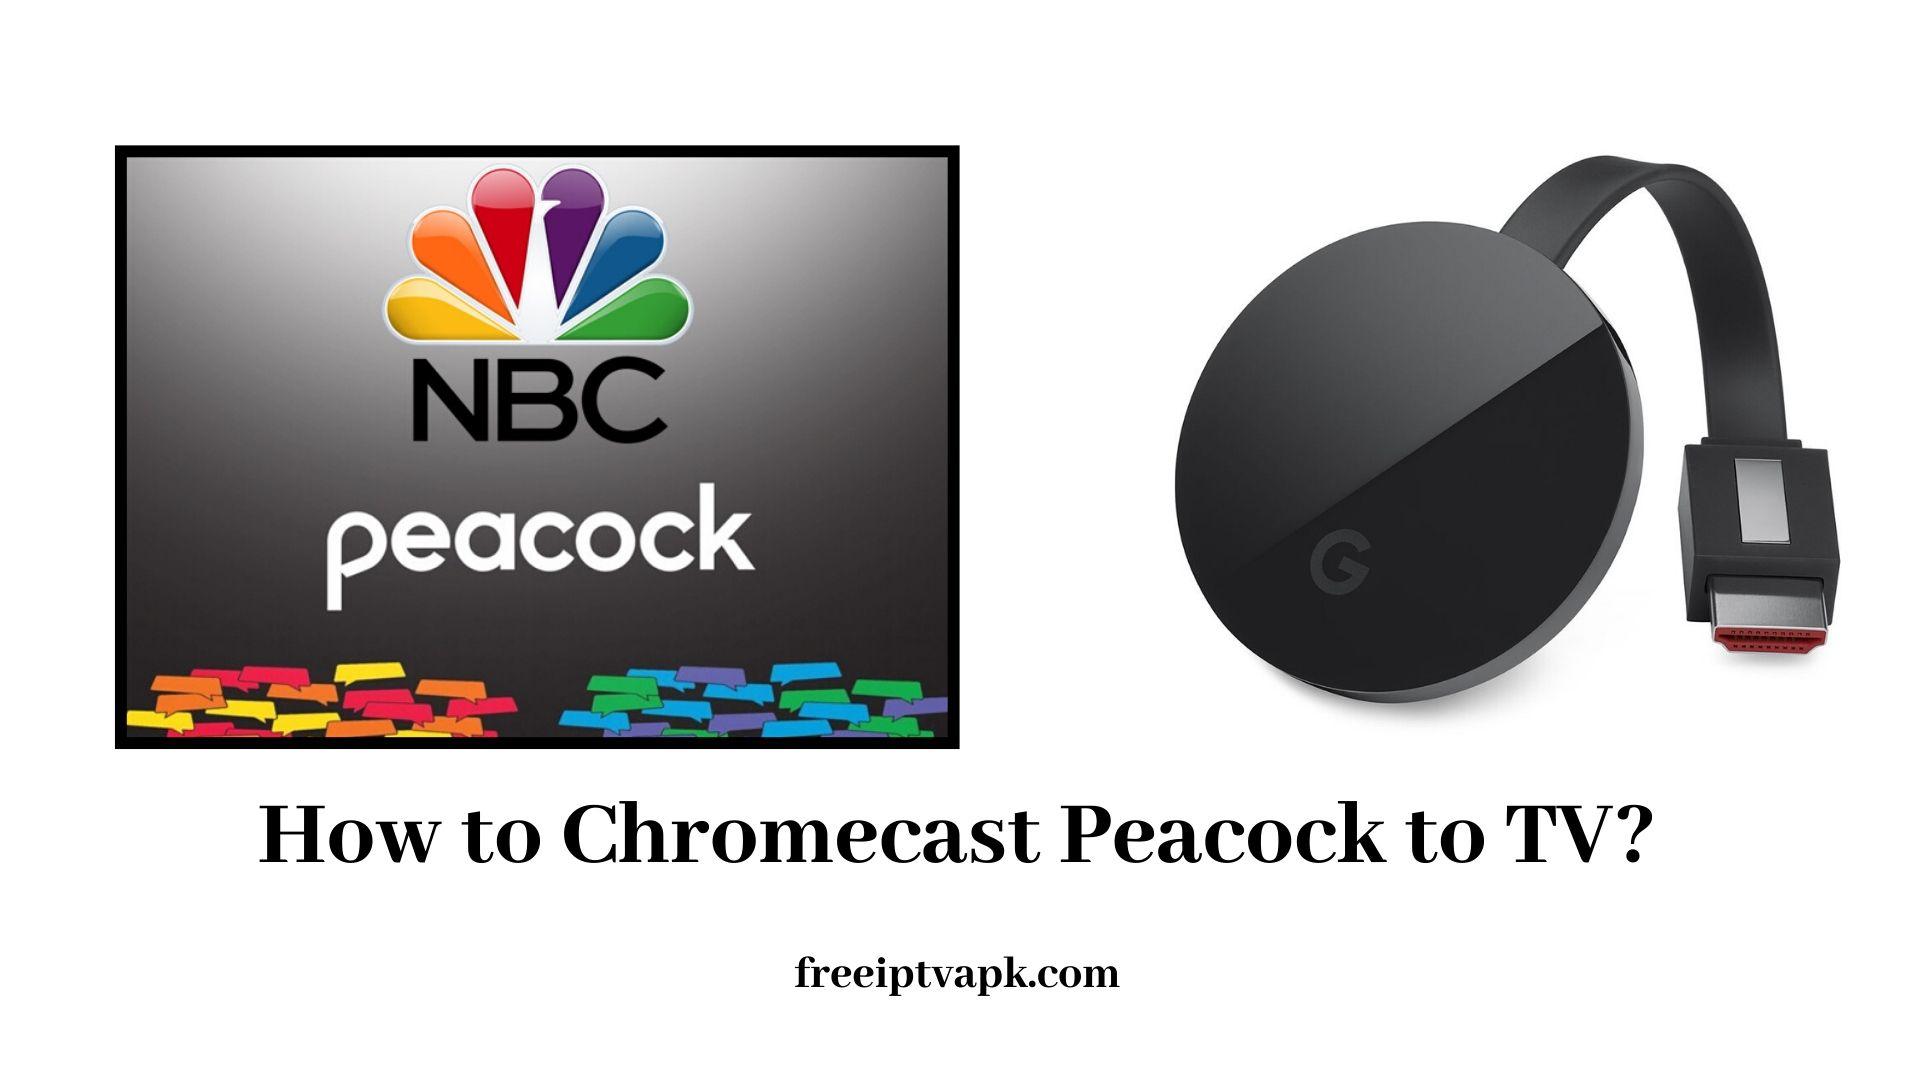 Peacock Chromecast